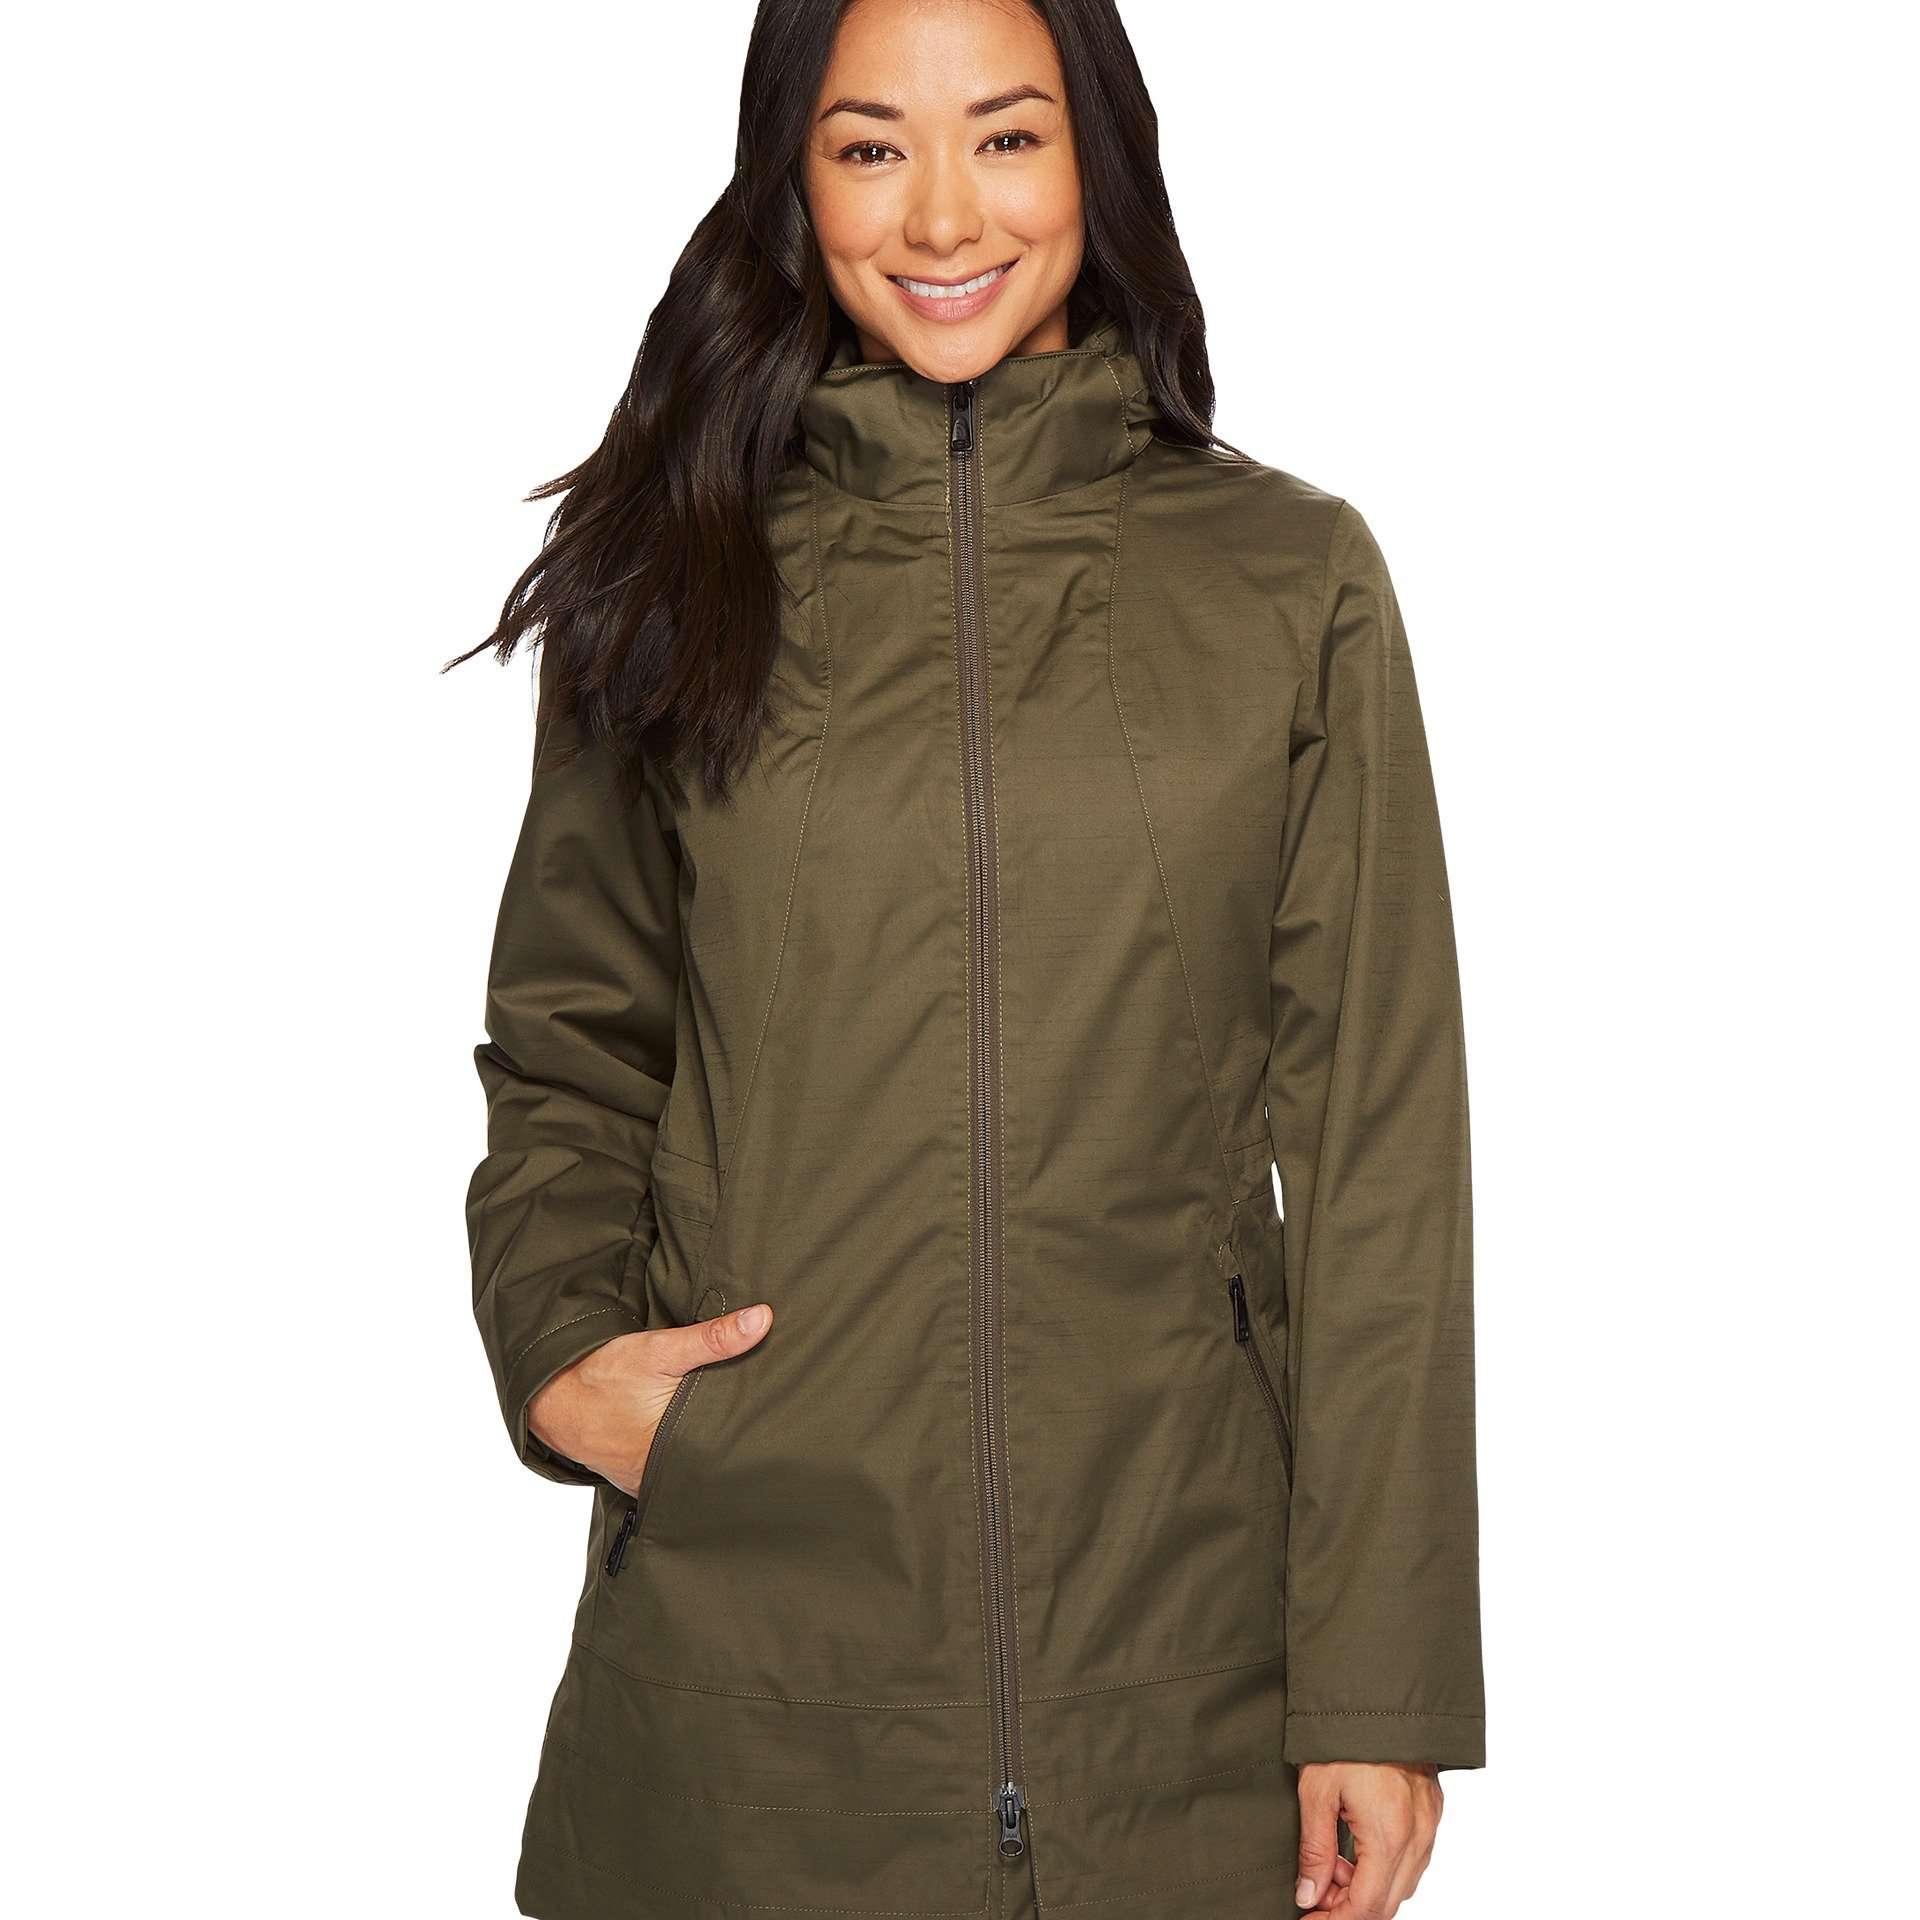 the 7 best raincoats